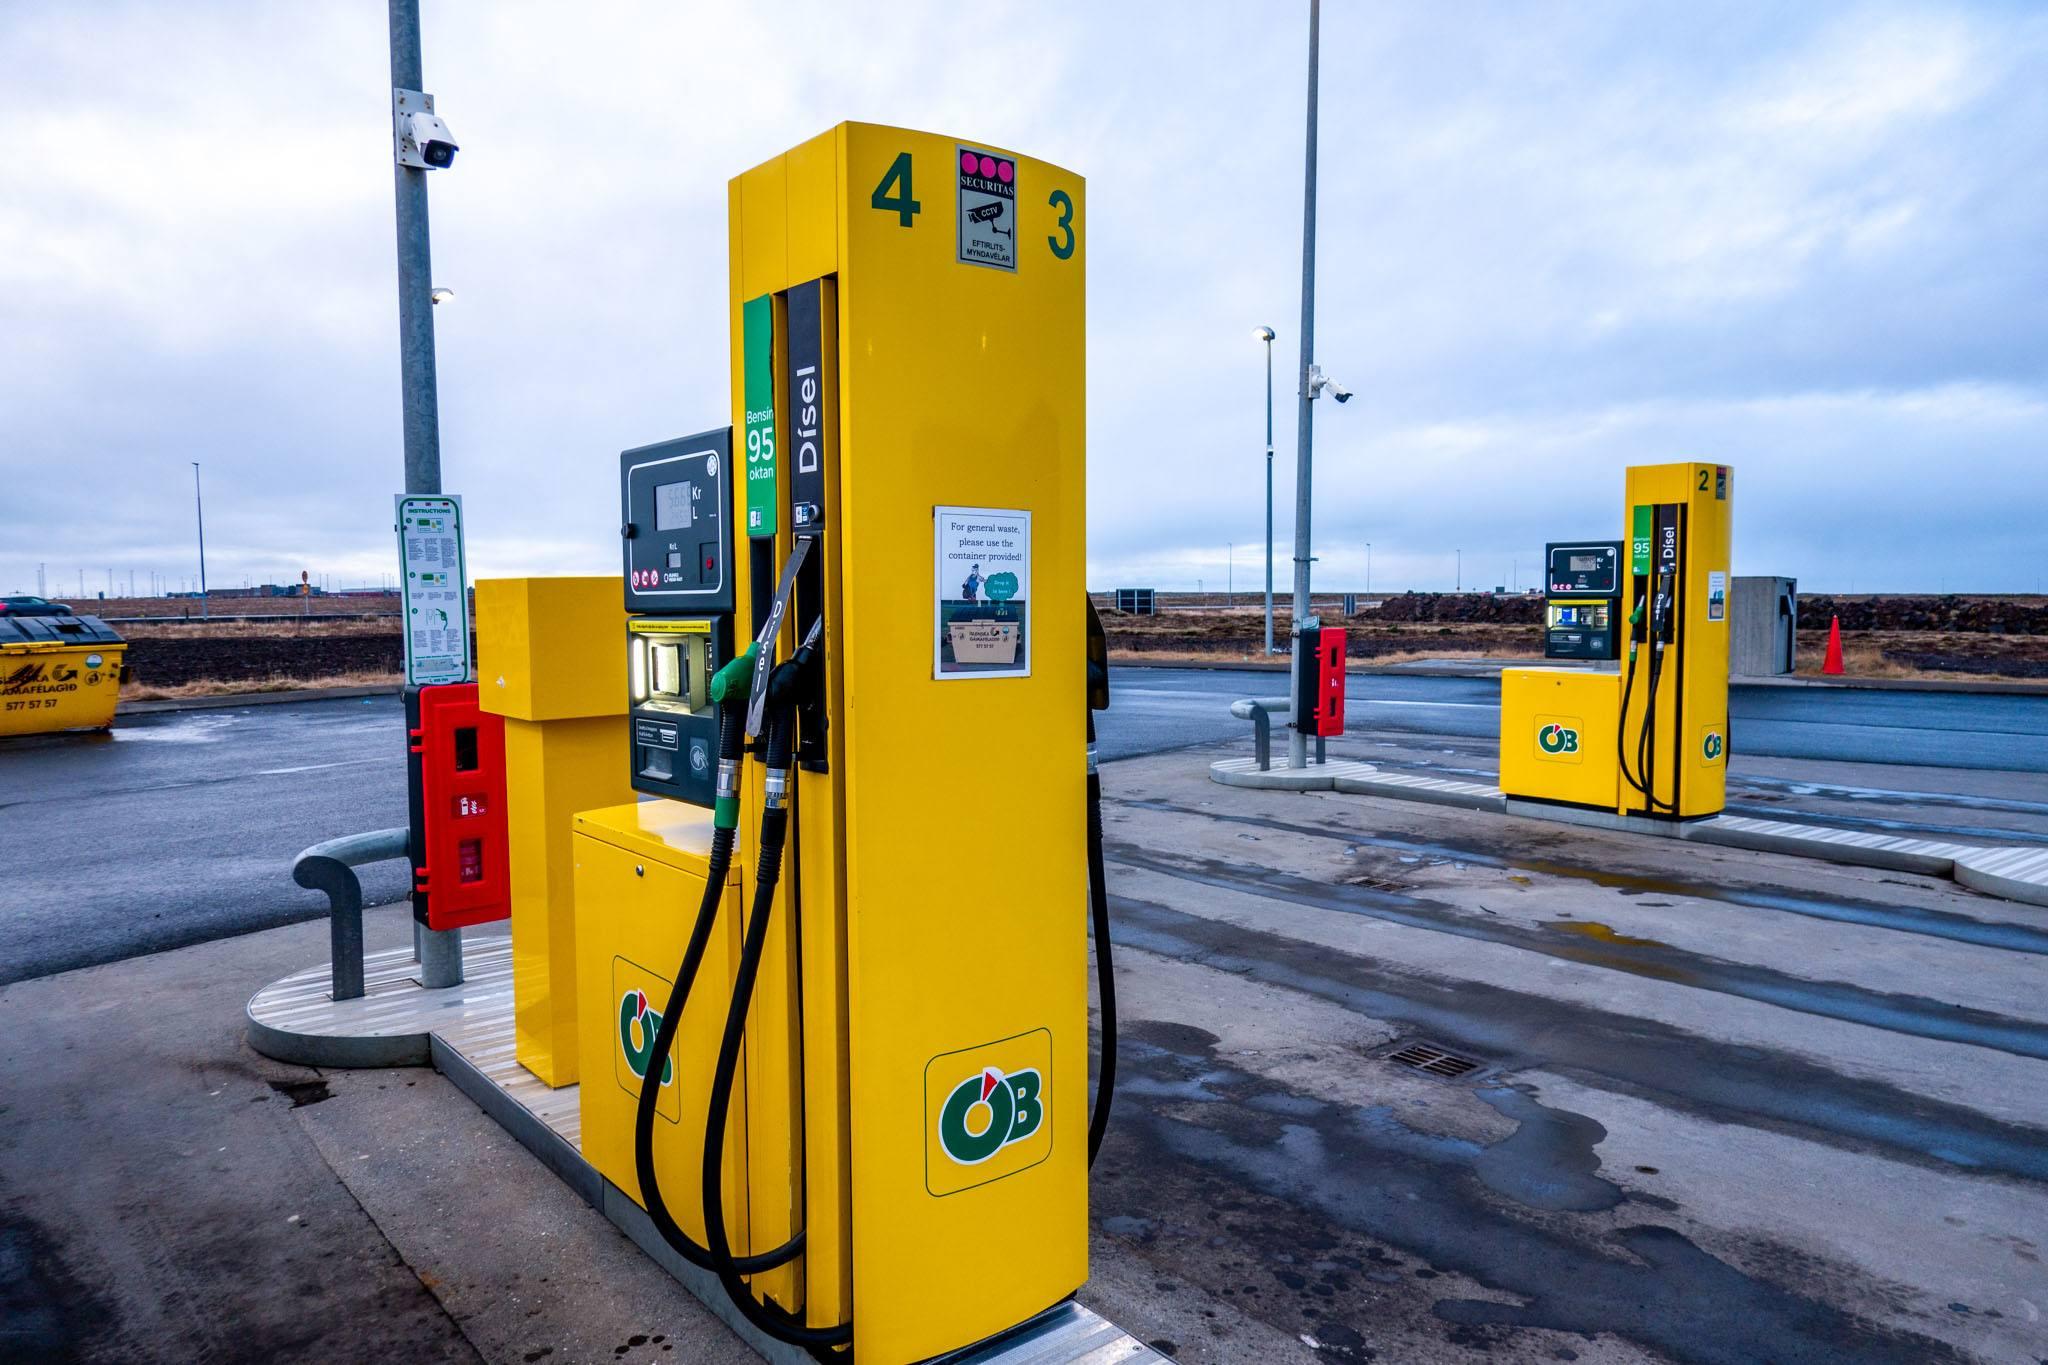 Gas pumps at an OB self-serve gas station